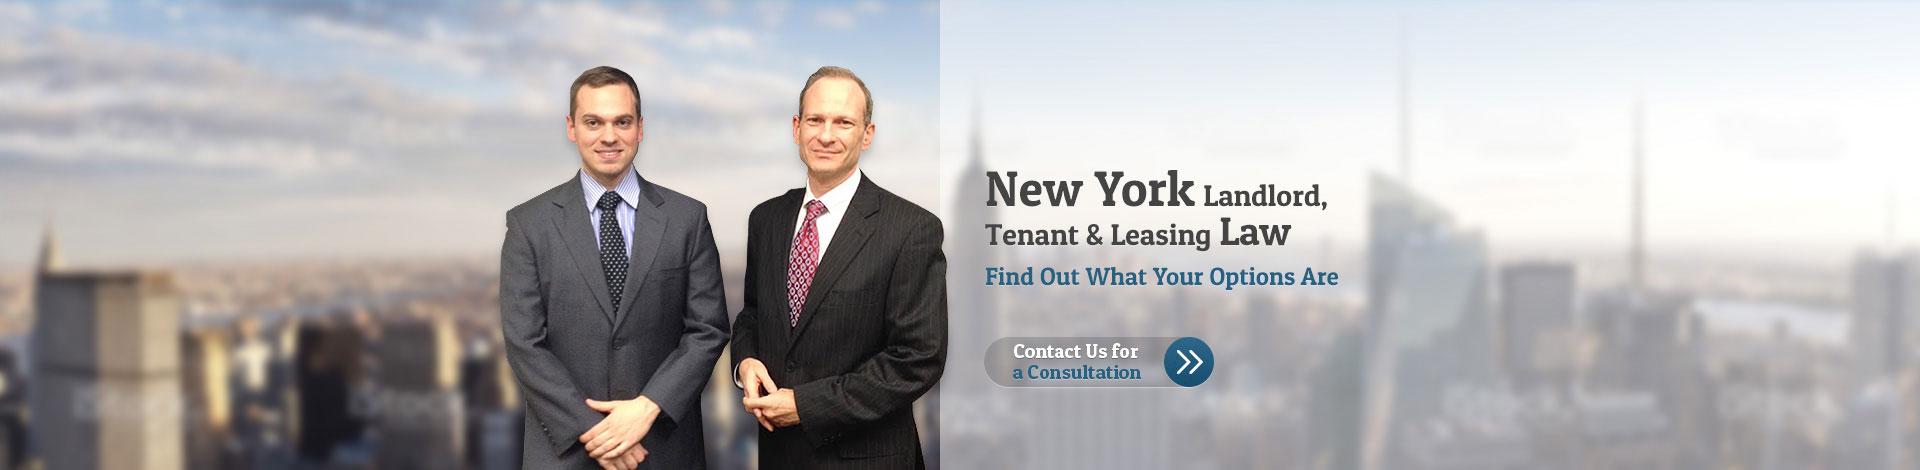 Washington State Real Estate Law